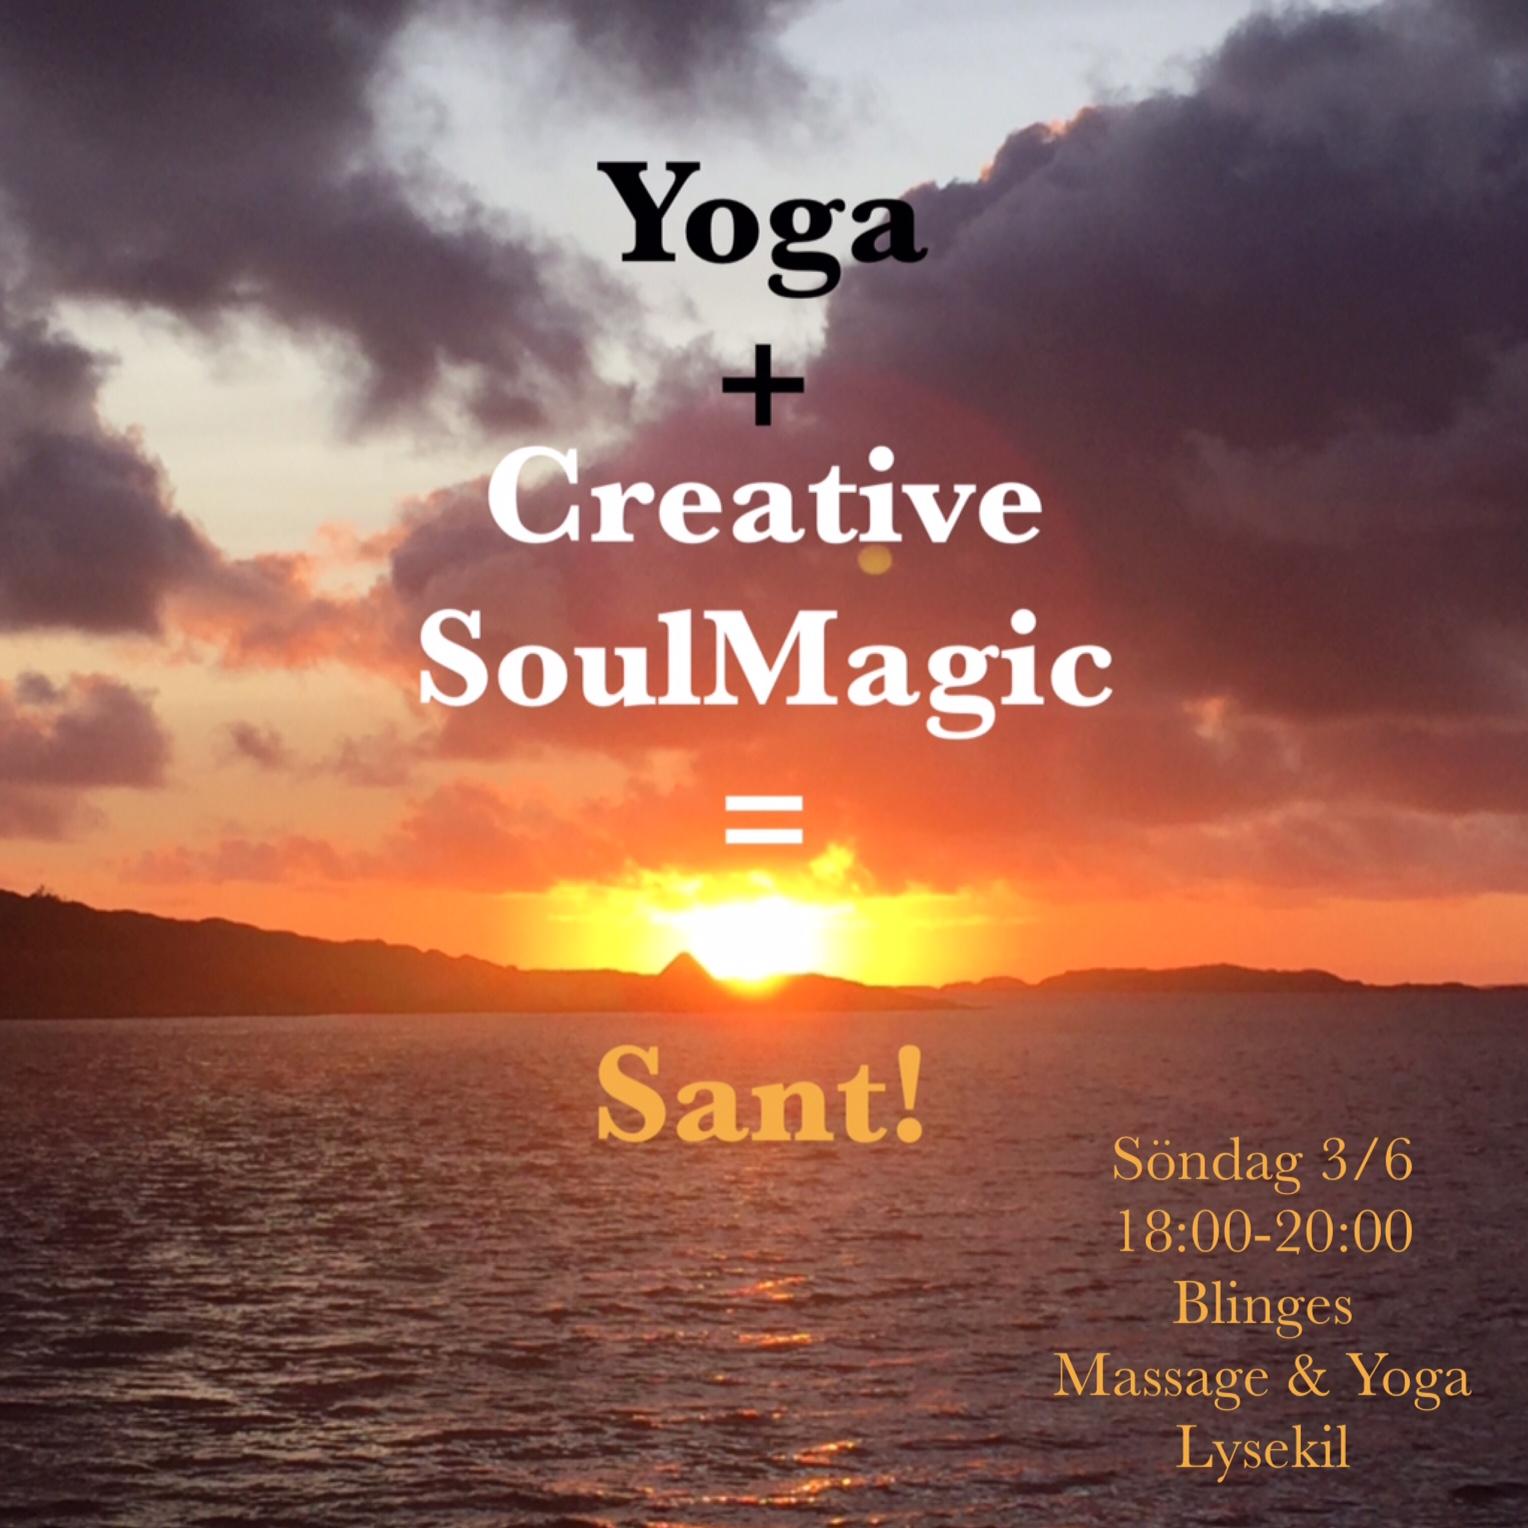 Yoga+Creative SoulMagic=Sant! 3 juni 2018.JPG